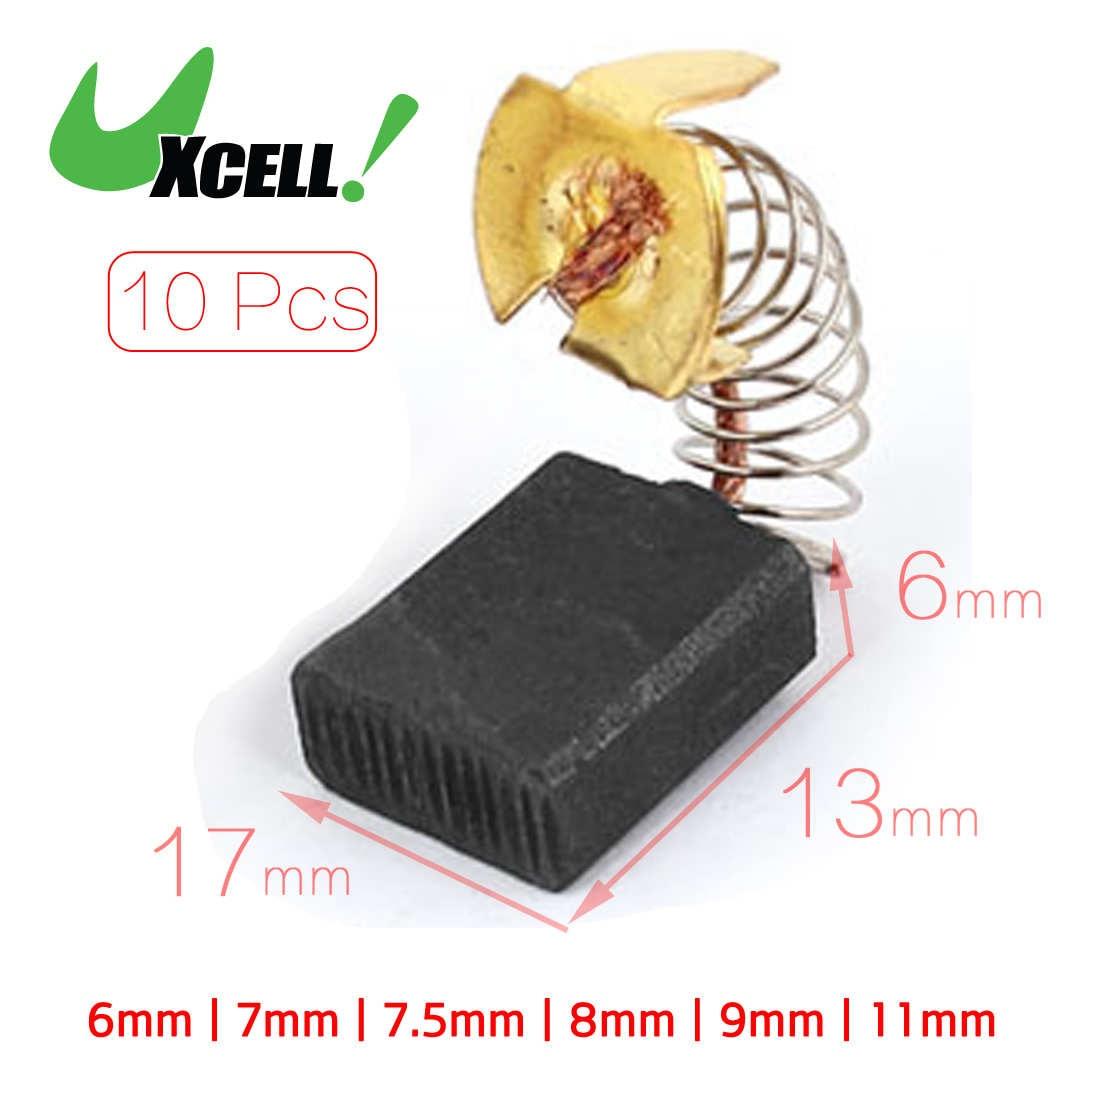 Dmiotech 10 Pcs Spring Carbon Brush Replacement For Power Drill 11mm 13mm 15mm 16mm 17mm 6mm 7.5mm 7mm 8mm